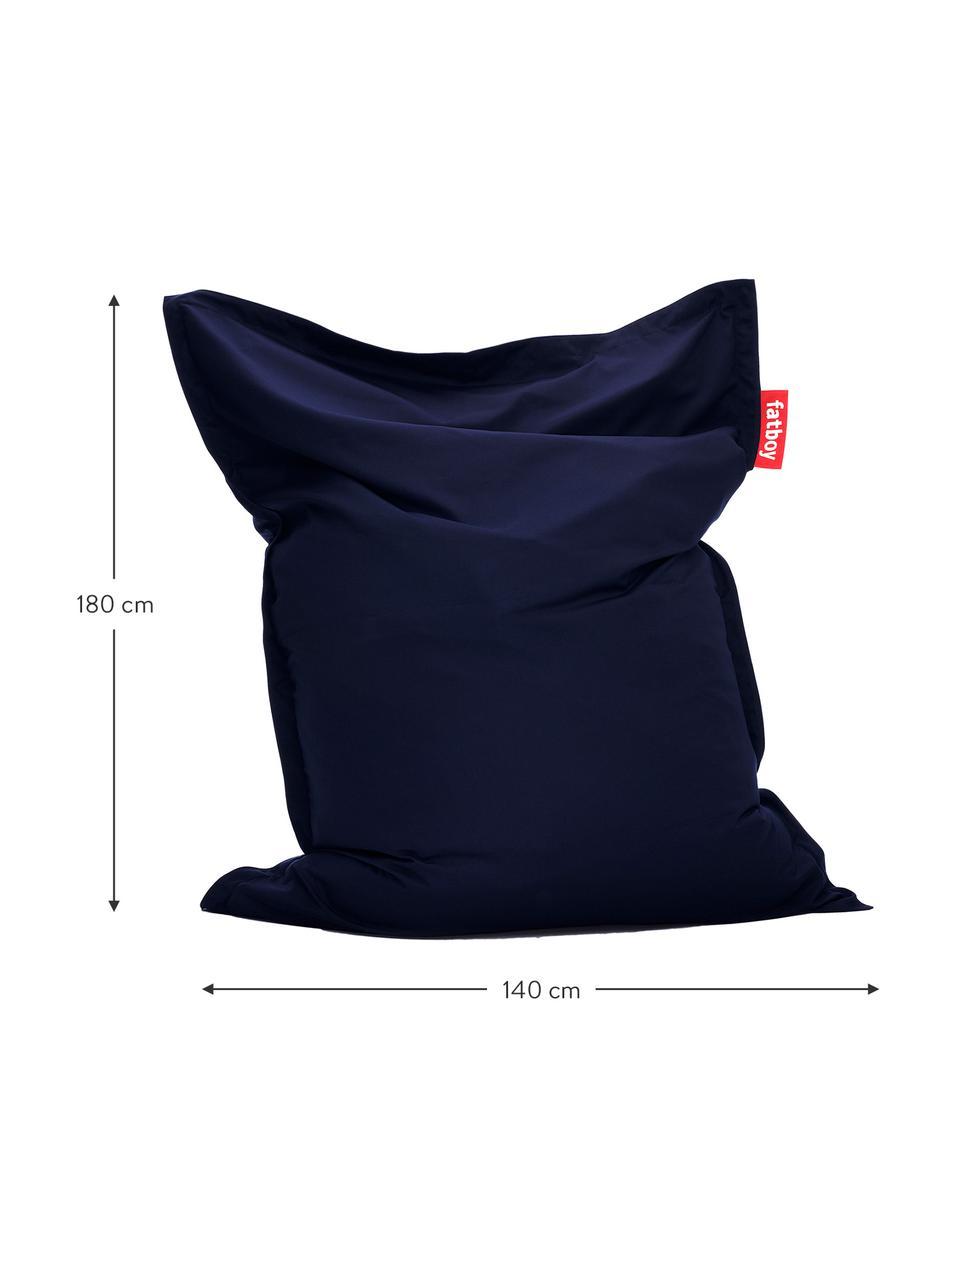 Sitzsack Original in Dunkelblau, Bezug: Sunbrella, Dunkelblau, 140 x 180 cm